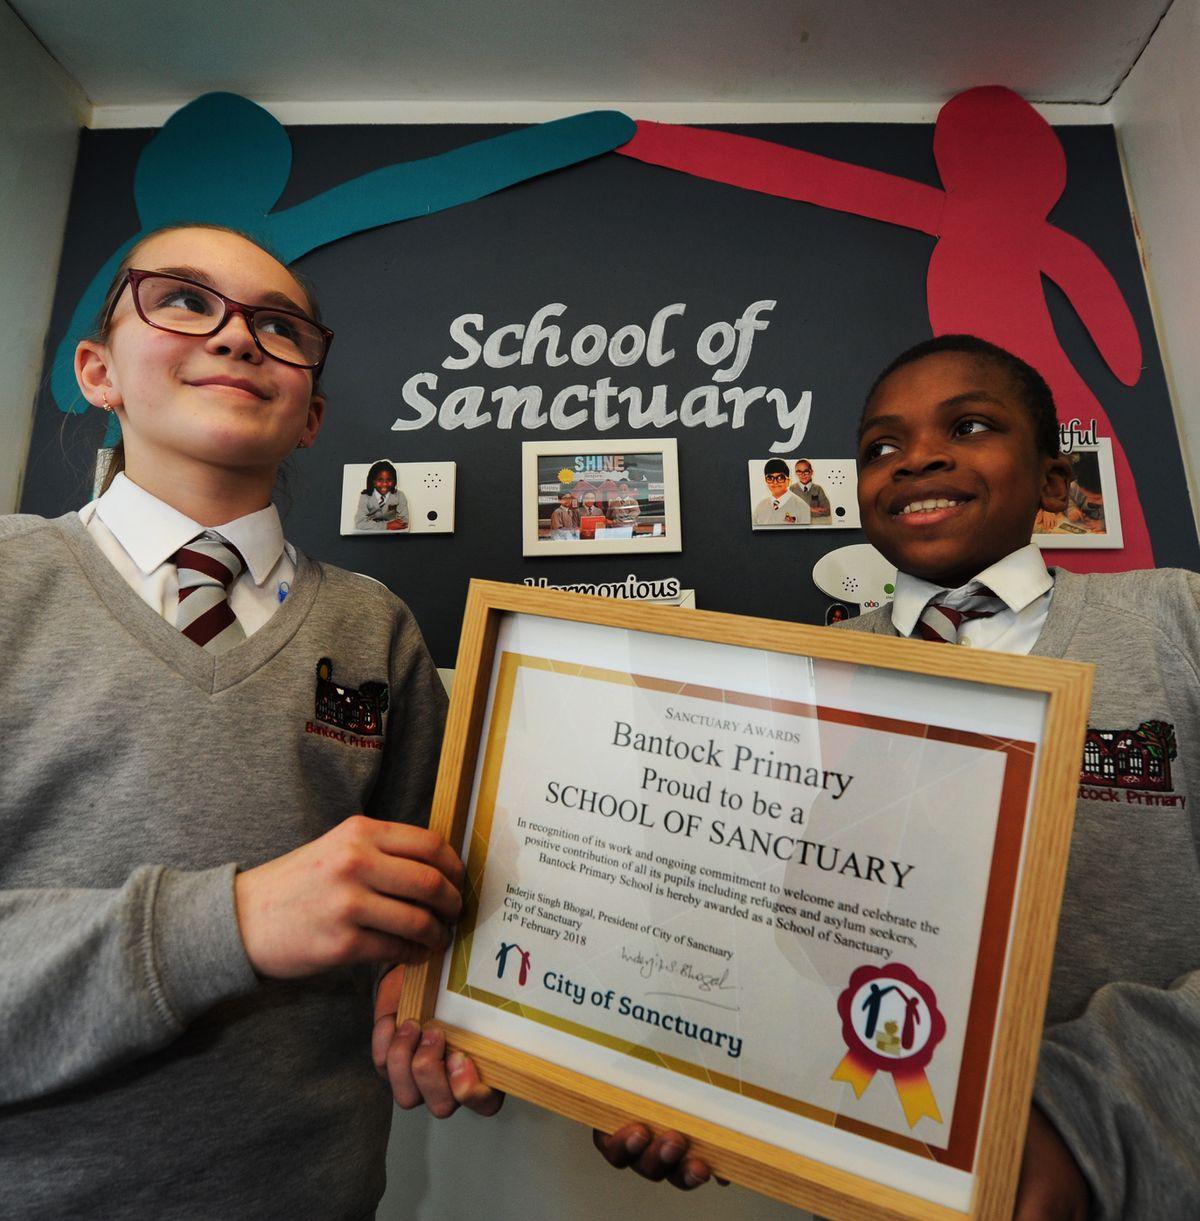 Gabija Lingyte (left) and Dammy Ope, both aged 10 at Bantock primary school